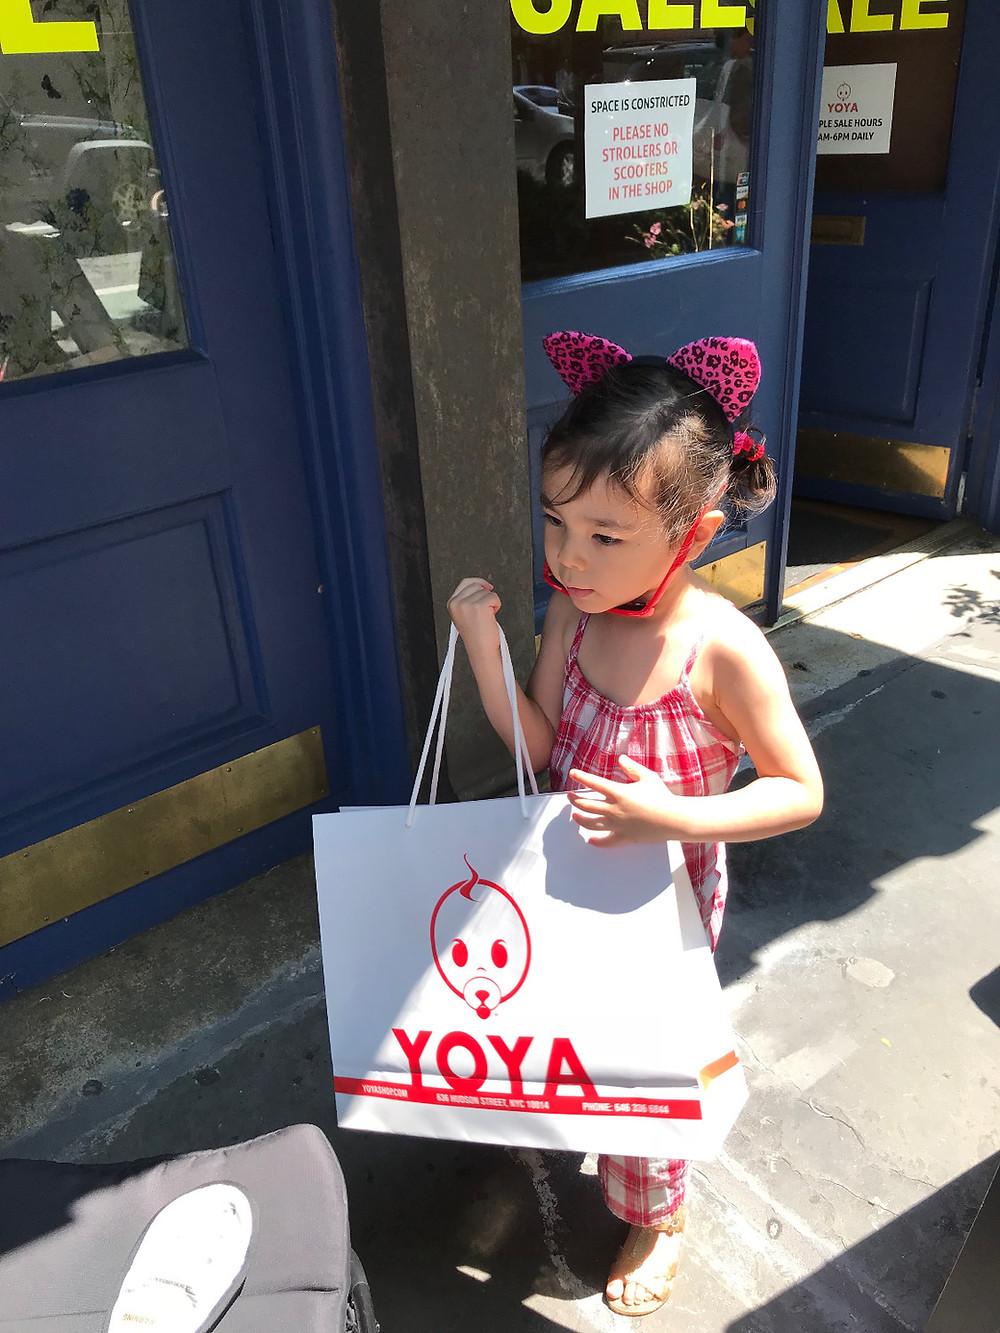 yoya, kids fashion, kids shopping, nyc shopping, west village shopping, sale, nyc kids